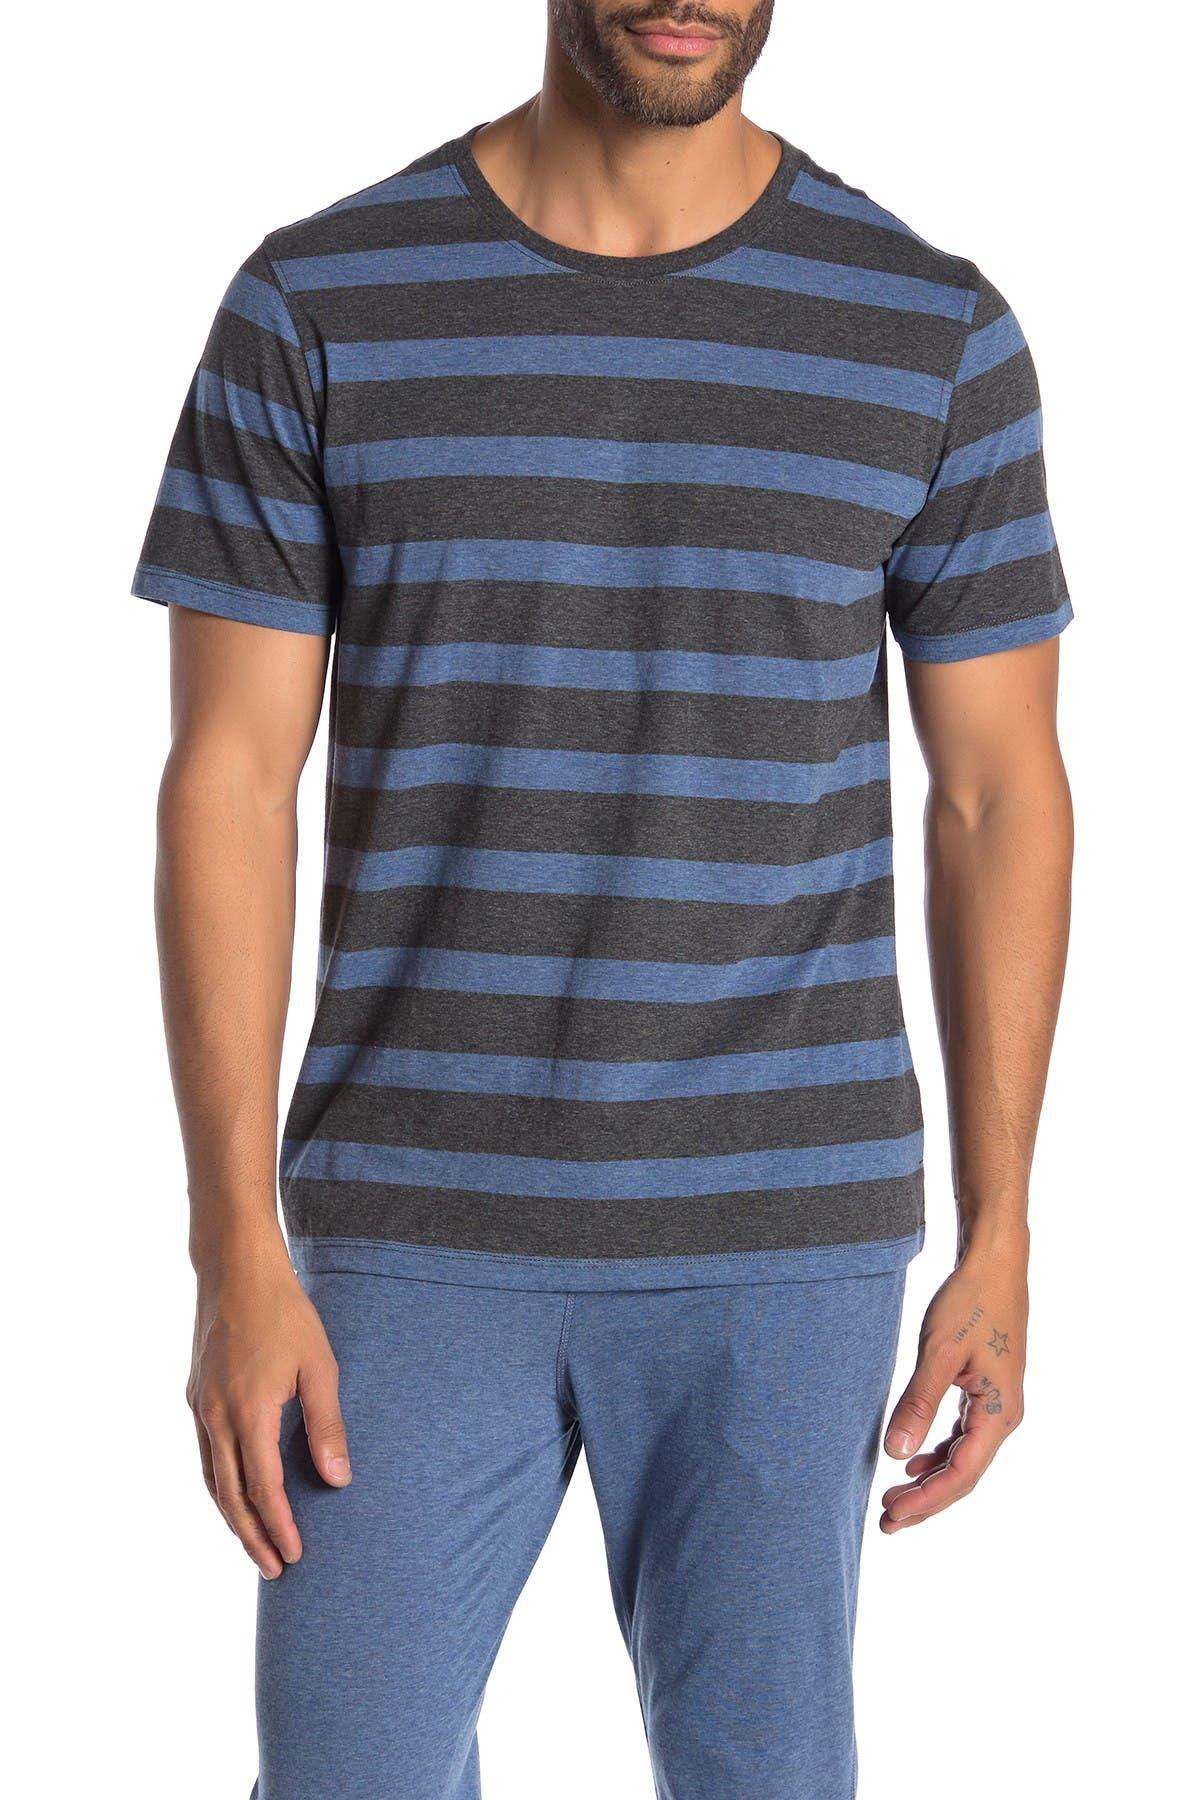 Daniel Buchler Striped Crew Neck Lounge T-Shirt